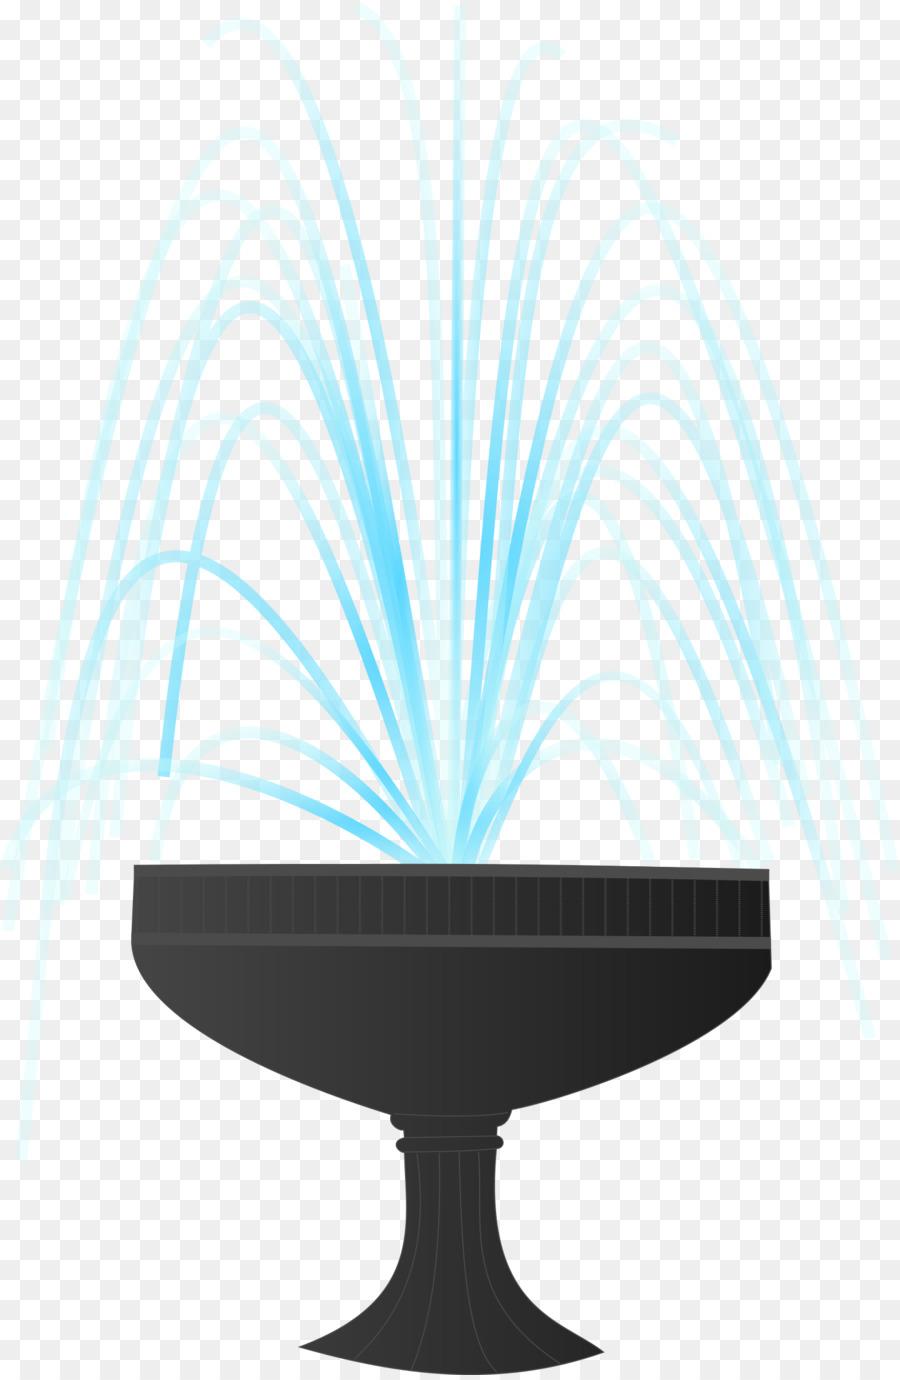 Drinking Fountains Clip art.